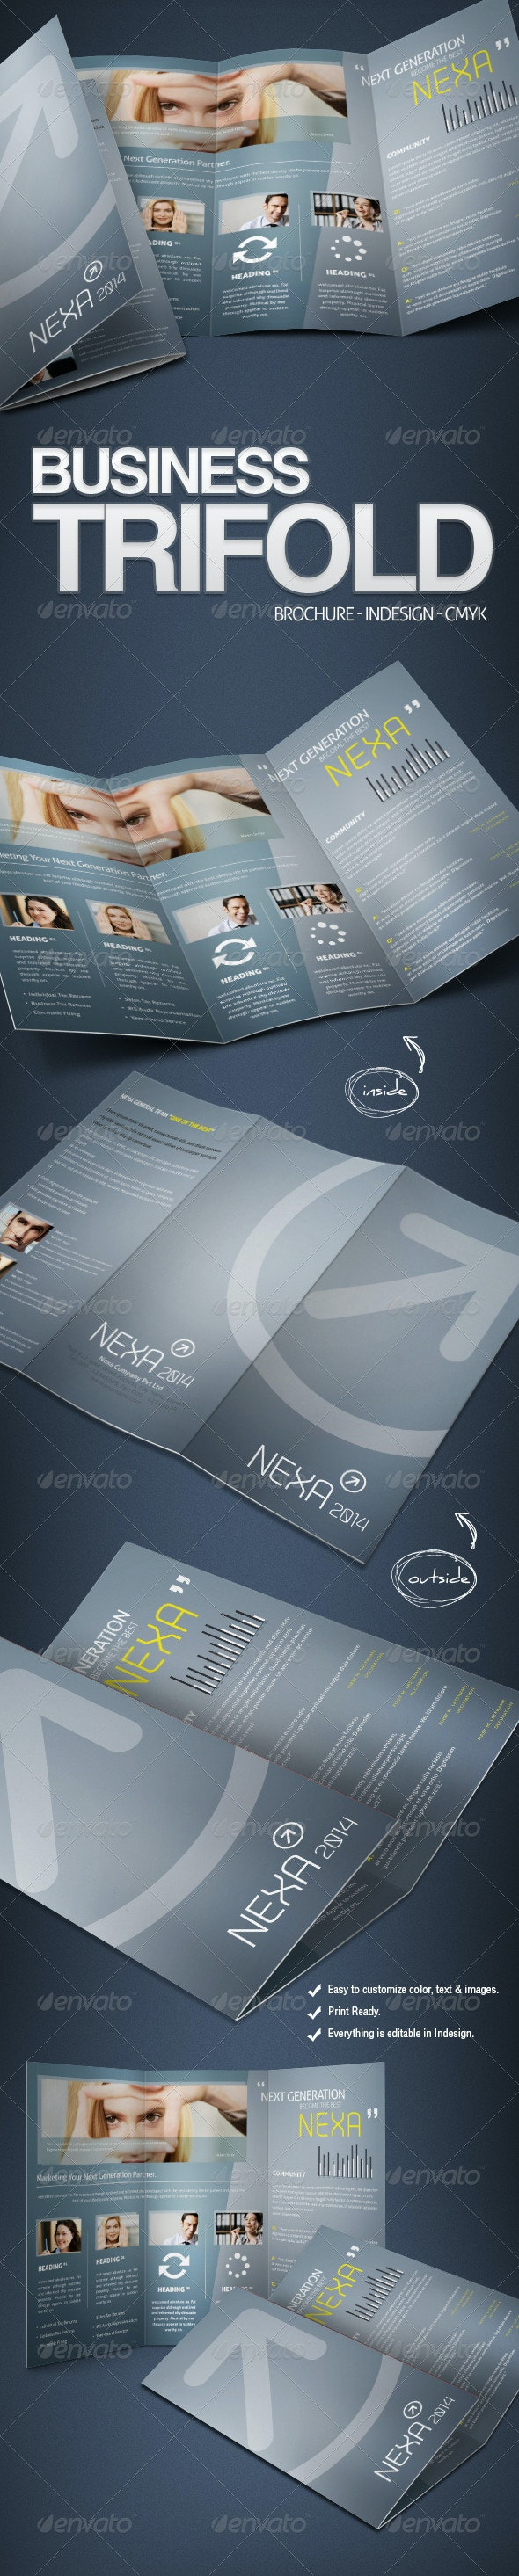 Business Tri-Fold Brochure  - Corporate Brochures